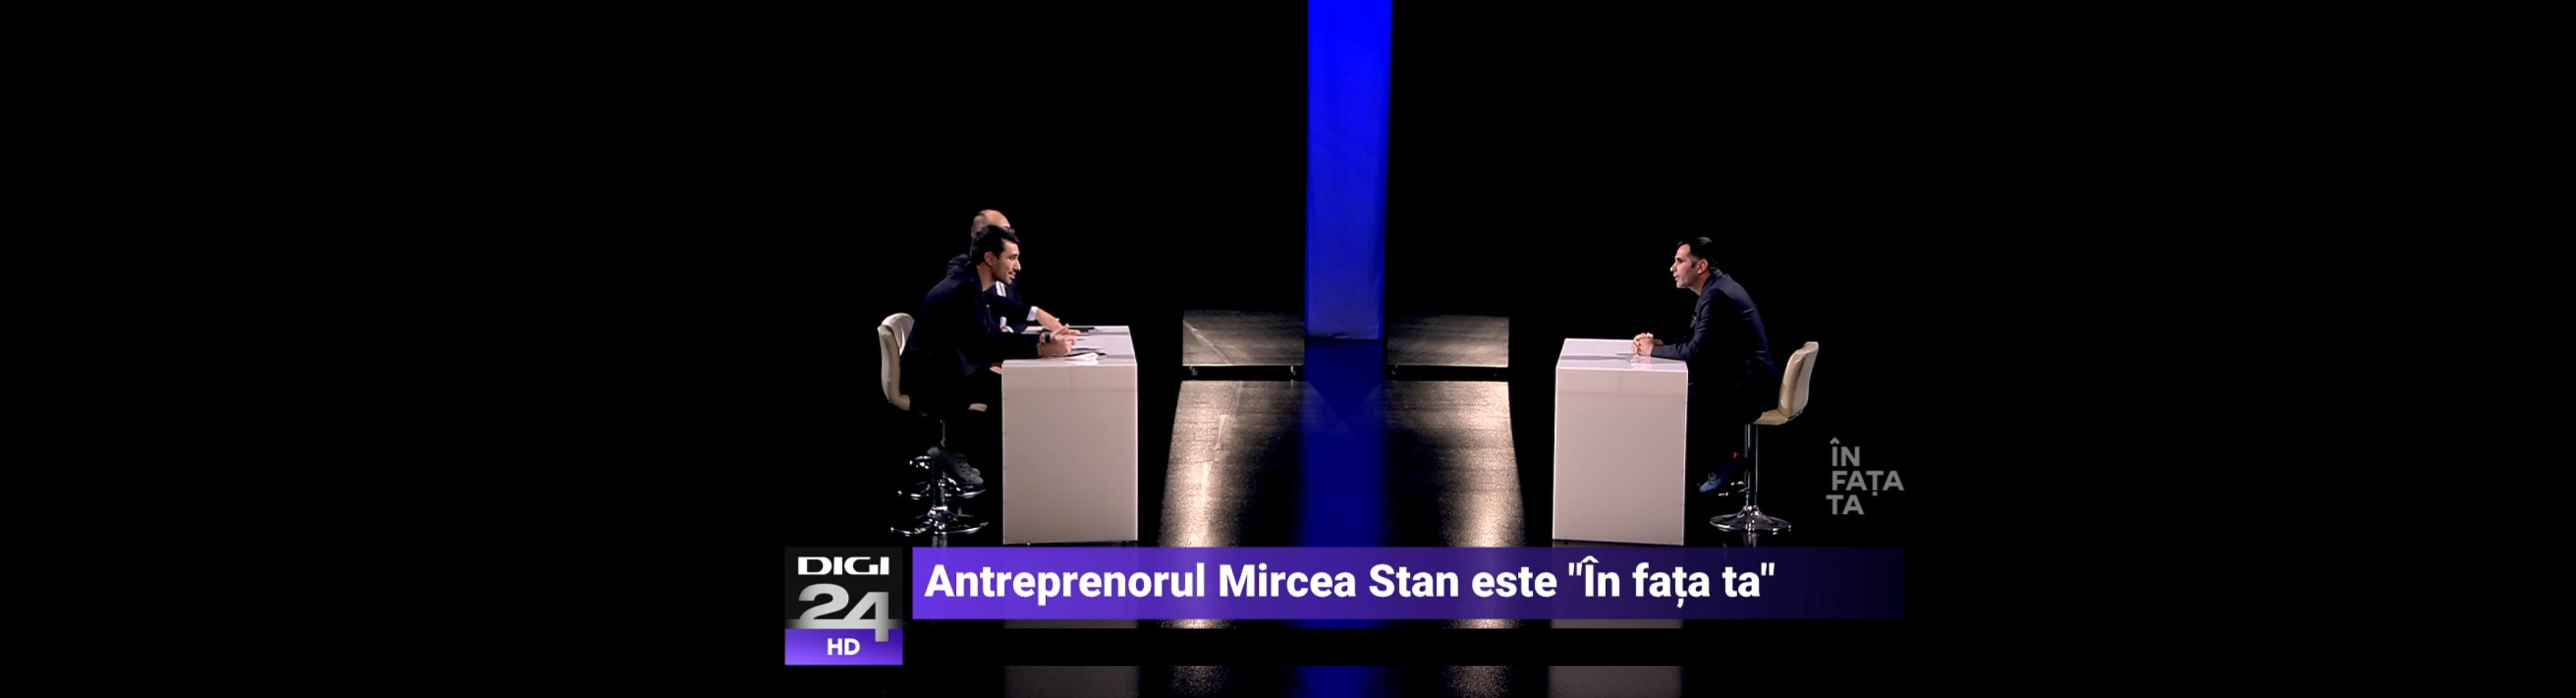 Mircea Stan la Digi24 în emisiunea n fața ta